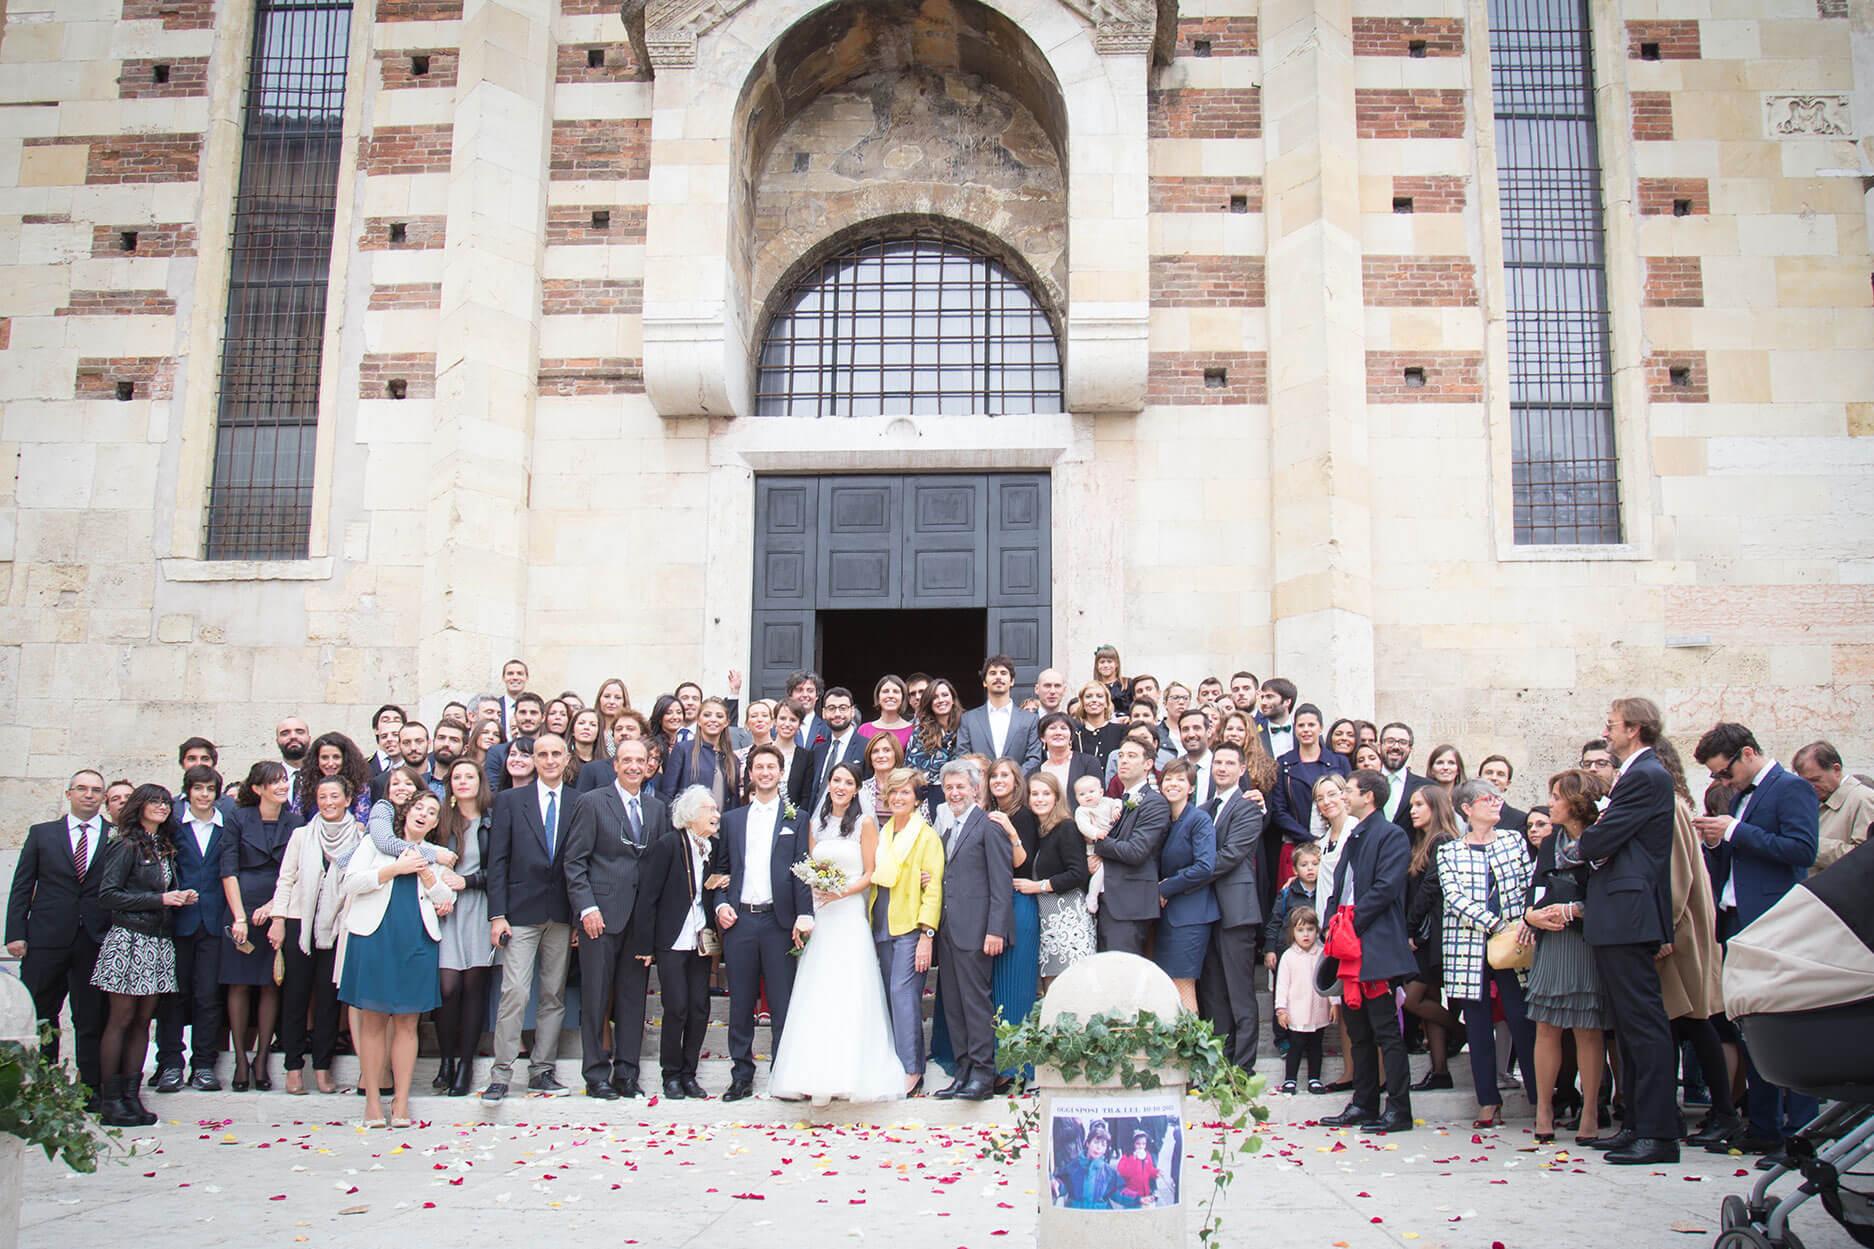 Francesca-Ferrati-wedding-photographer-Verona-Elena-Tommaso21